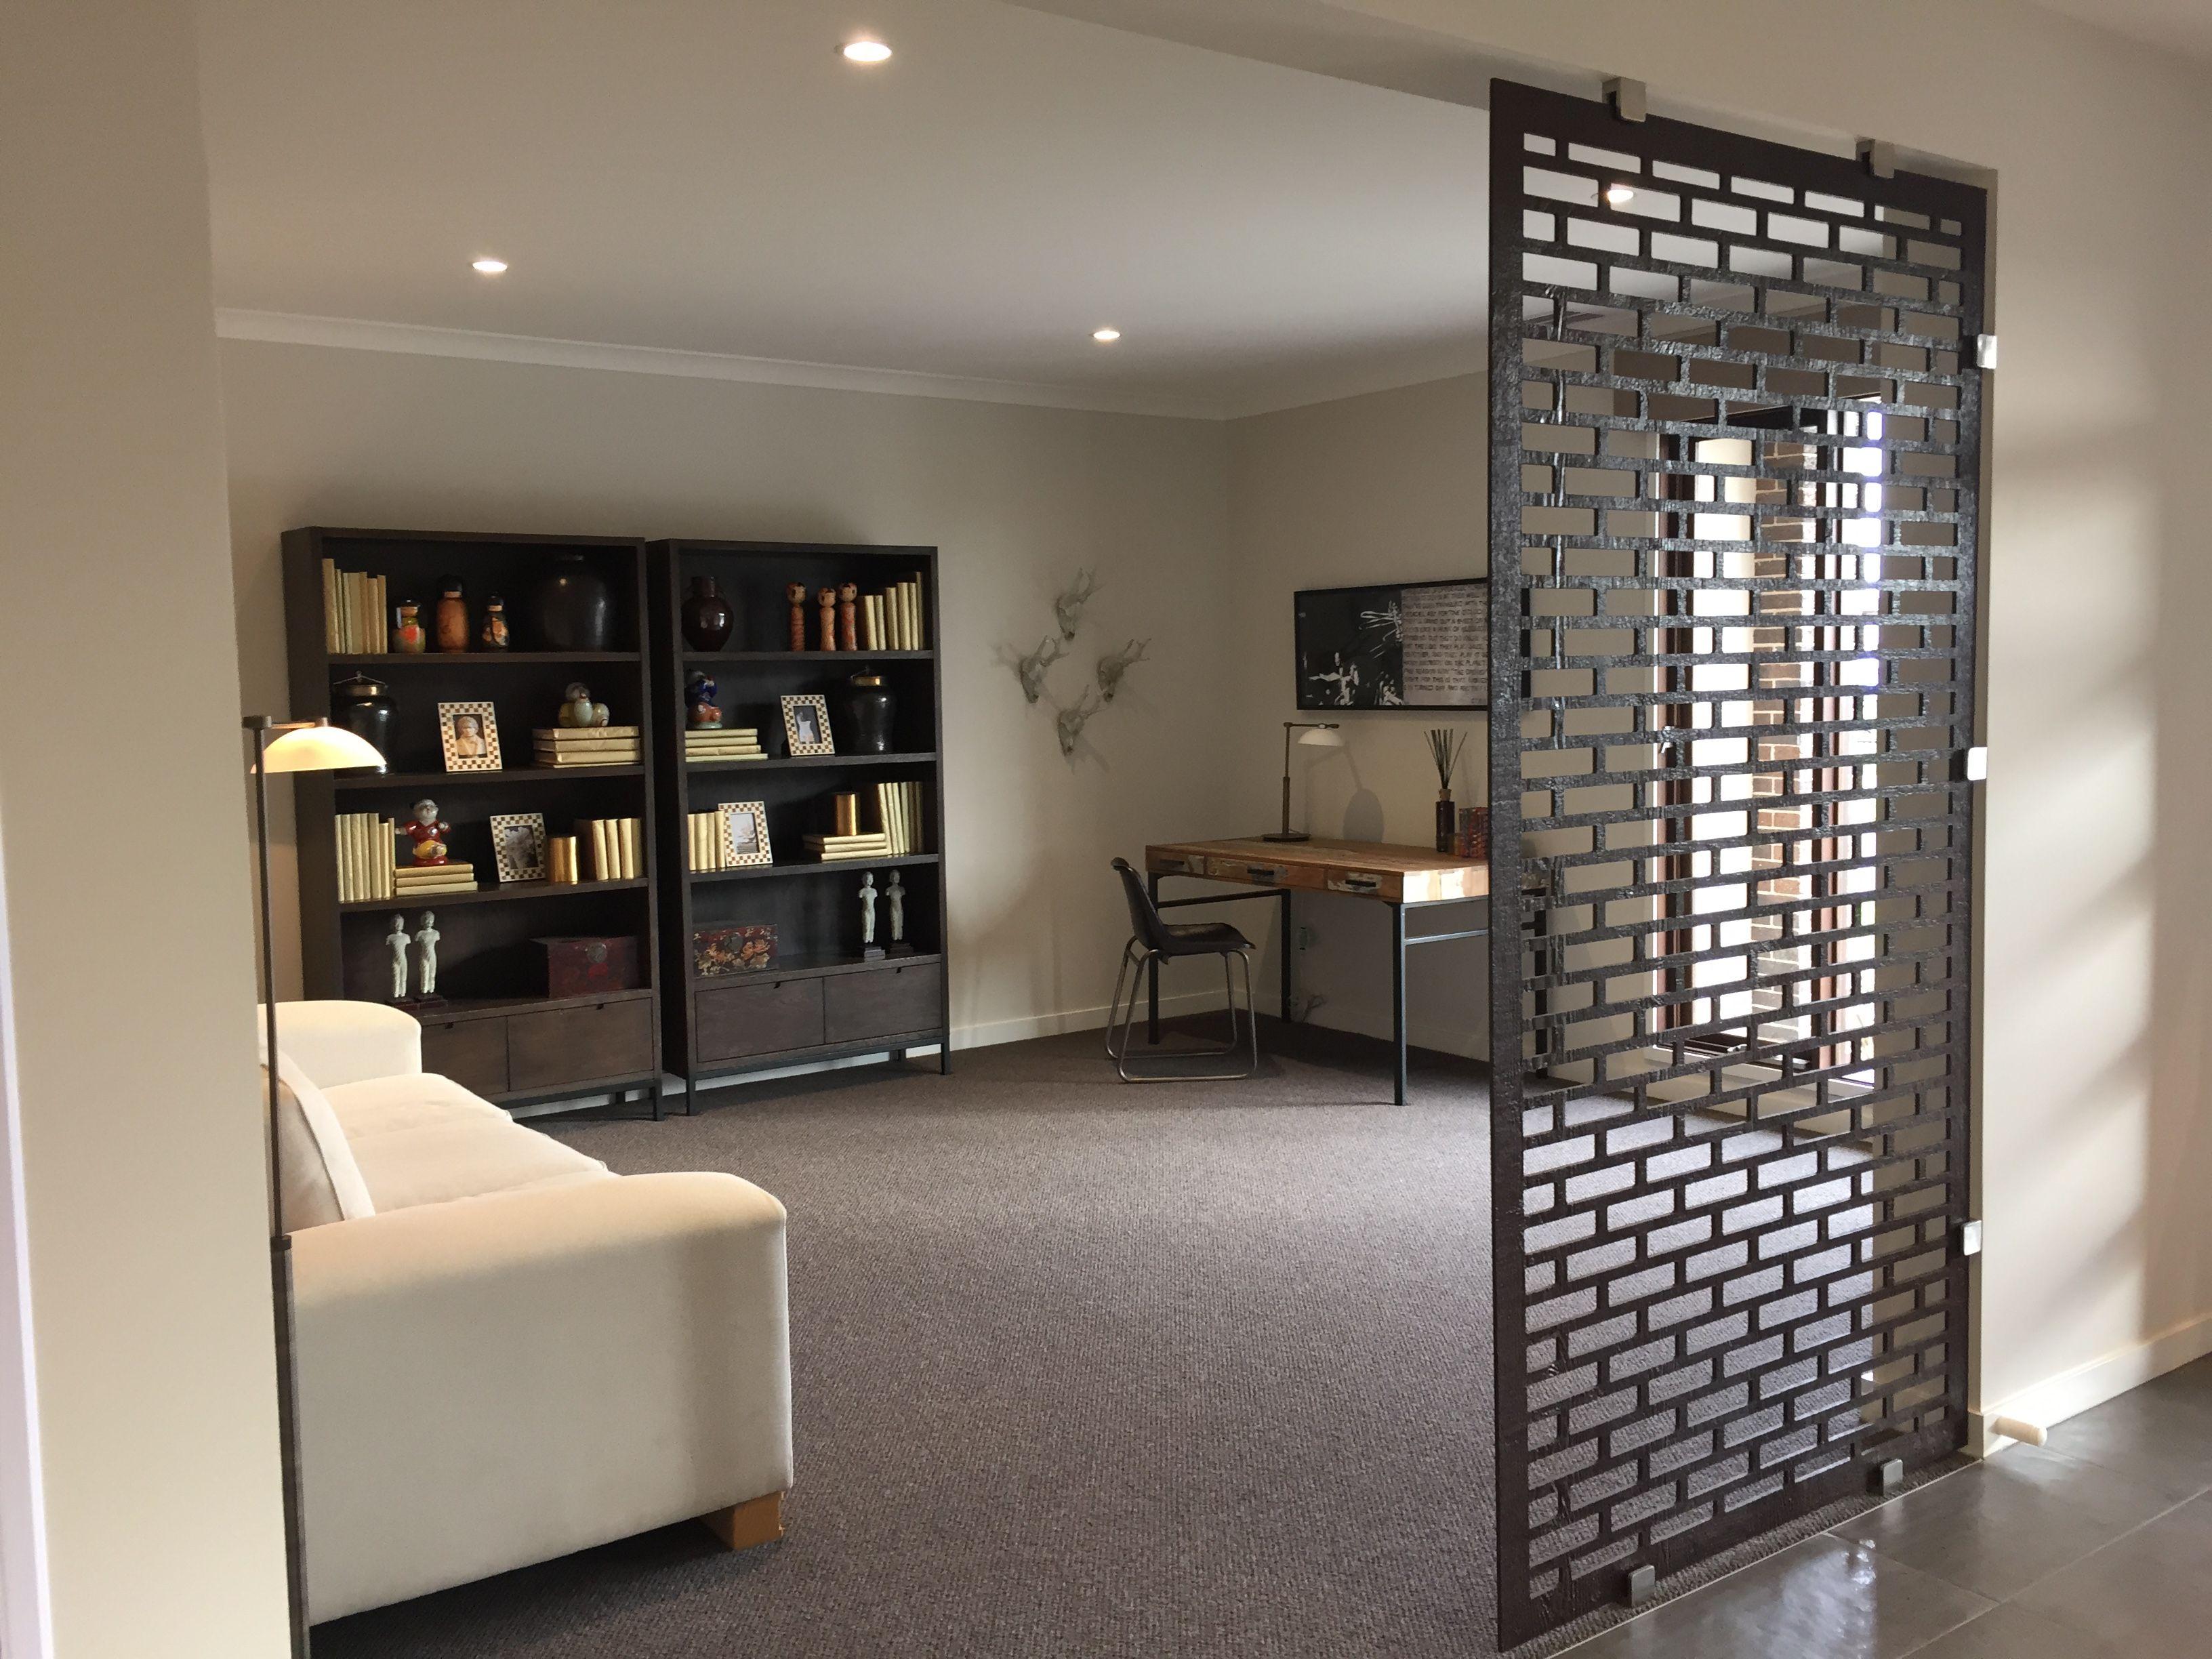 Gallery Luxury Decor Decorative Room Dividers Decorative